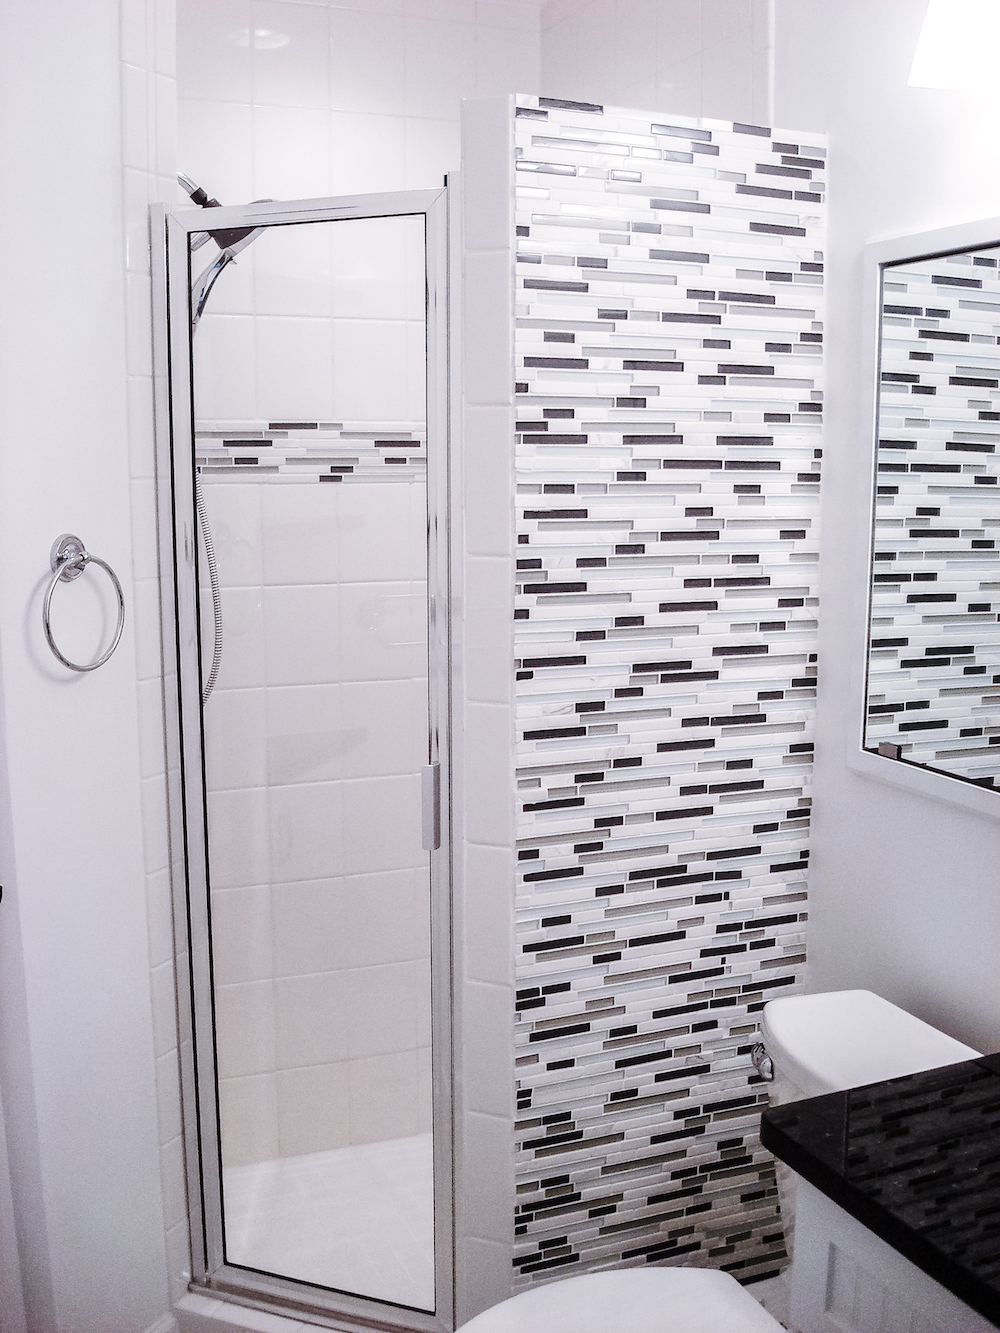 Tiled shower installation